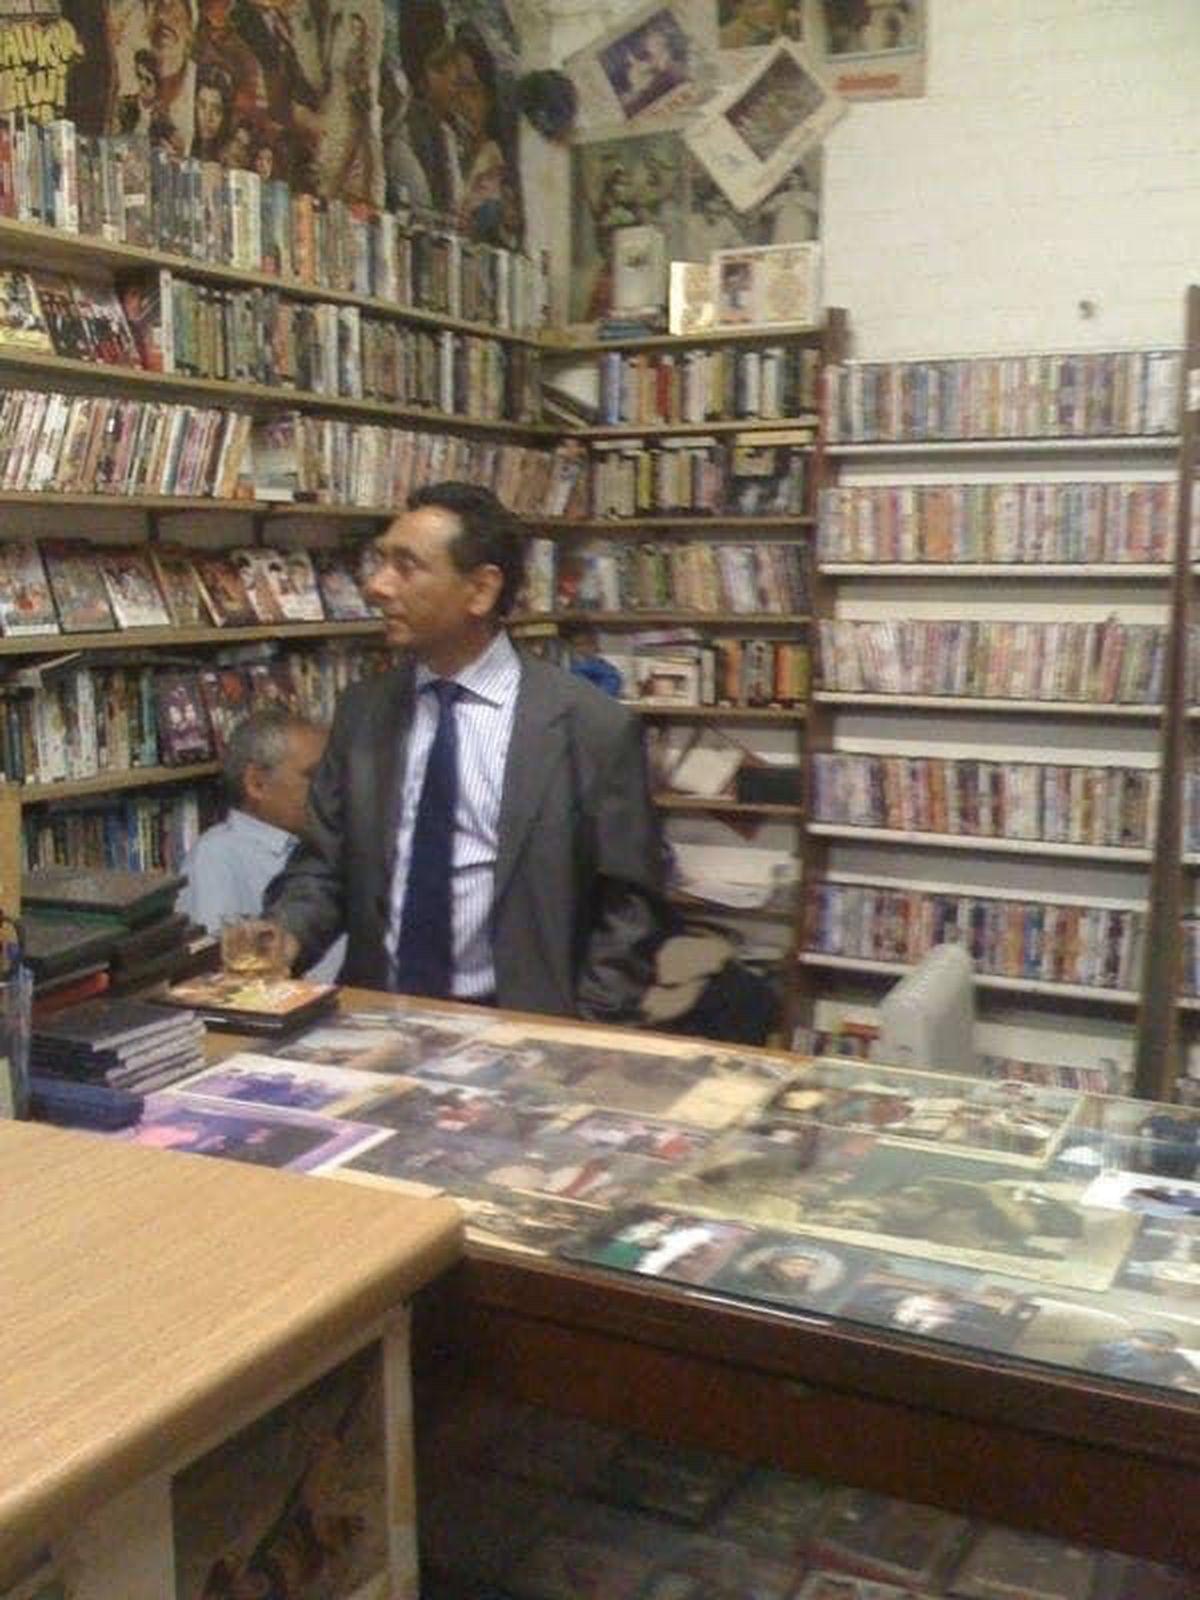 Surinder Singh Bahara at work in his video shop